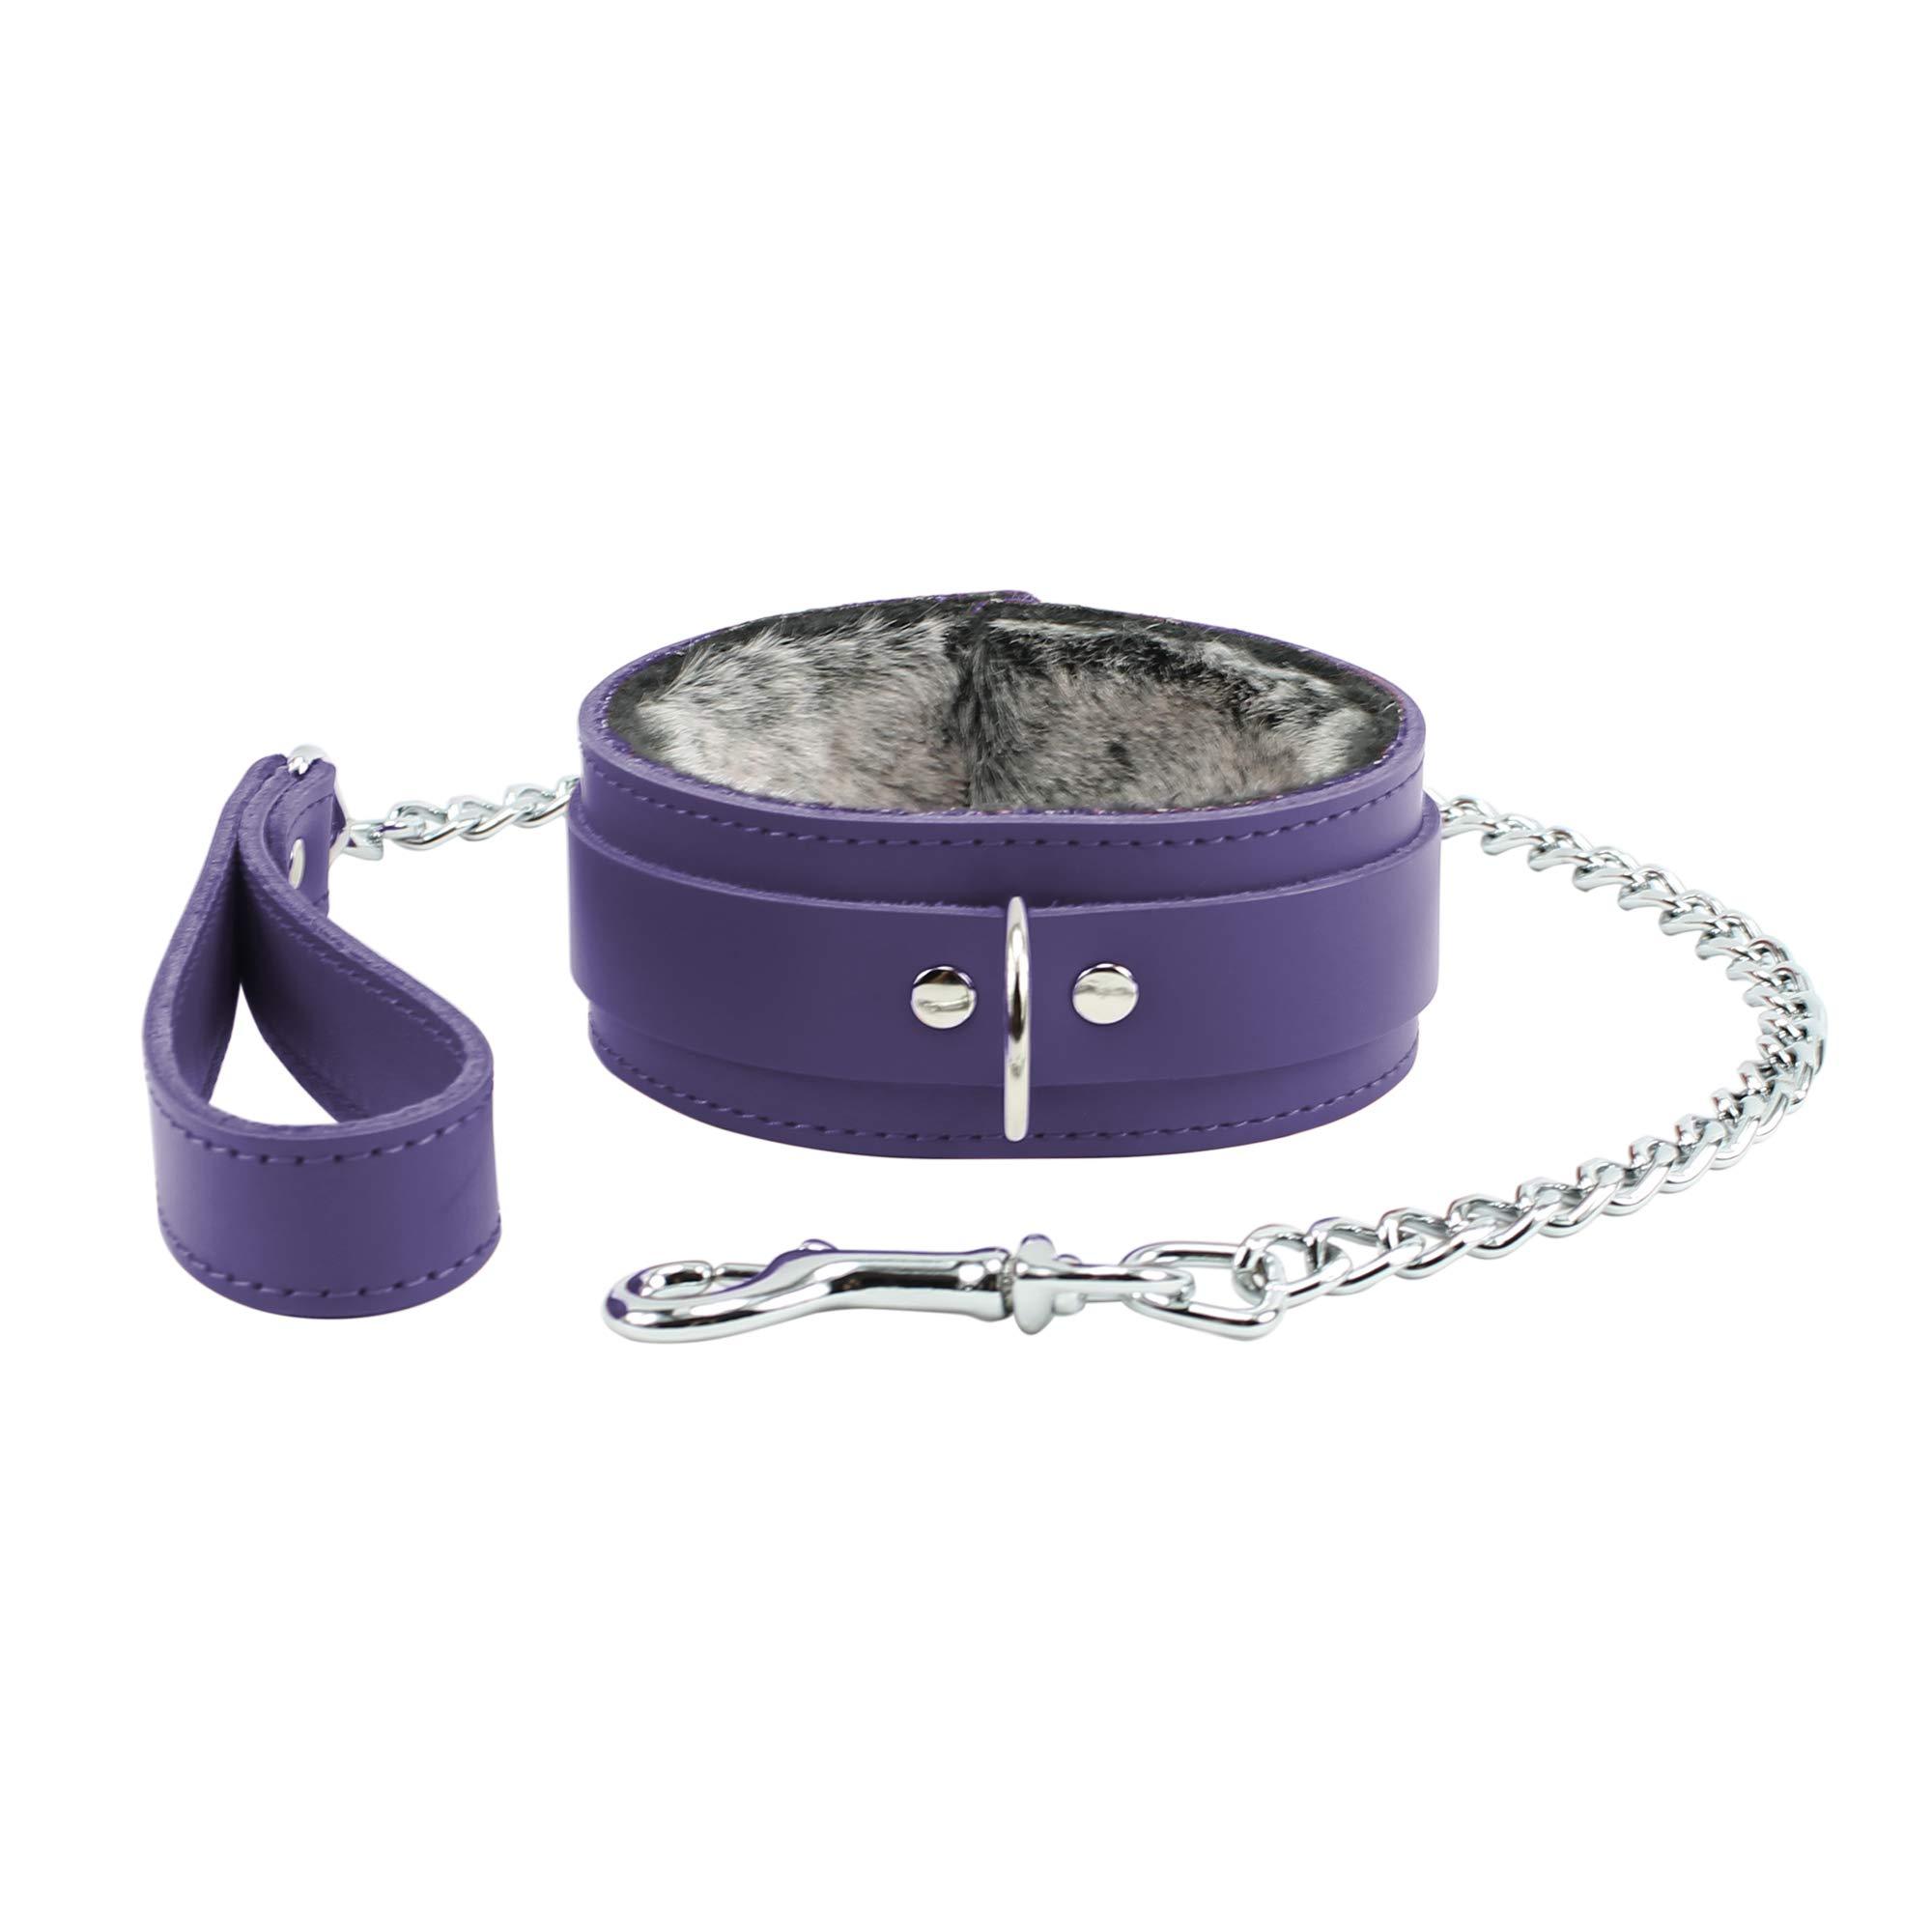 Atlas Collar And Leash Handcrafted Premium Latigo Leather Soft Fur Lining (Royal Purple)